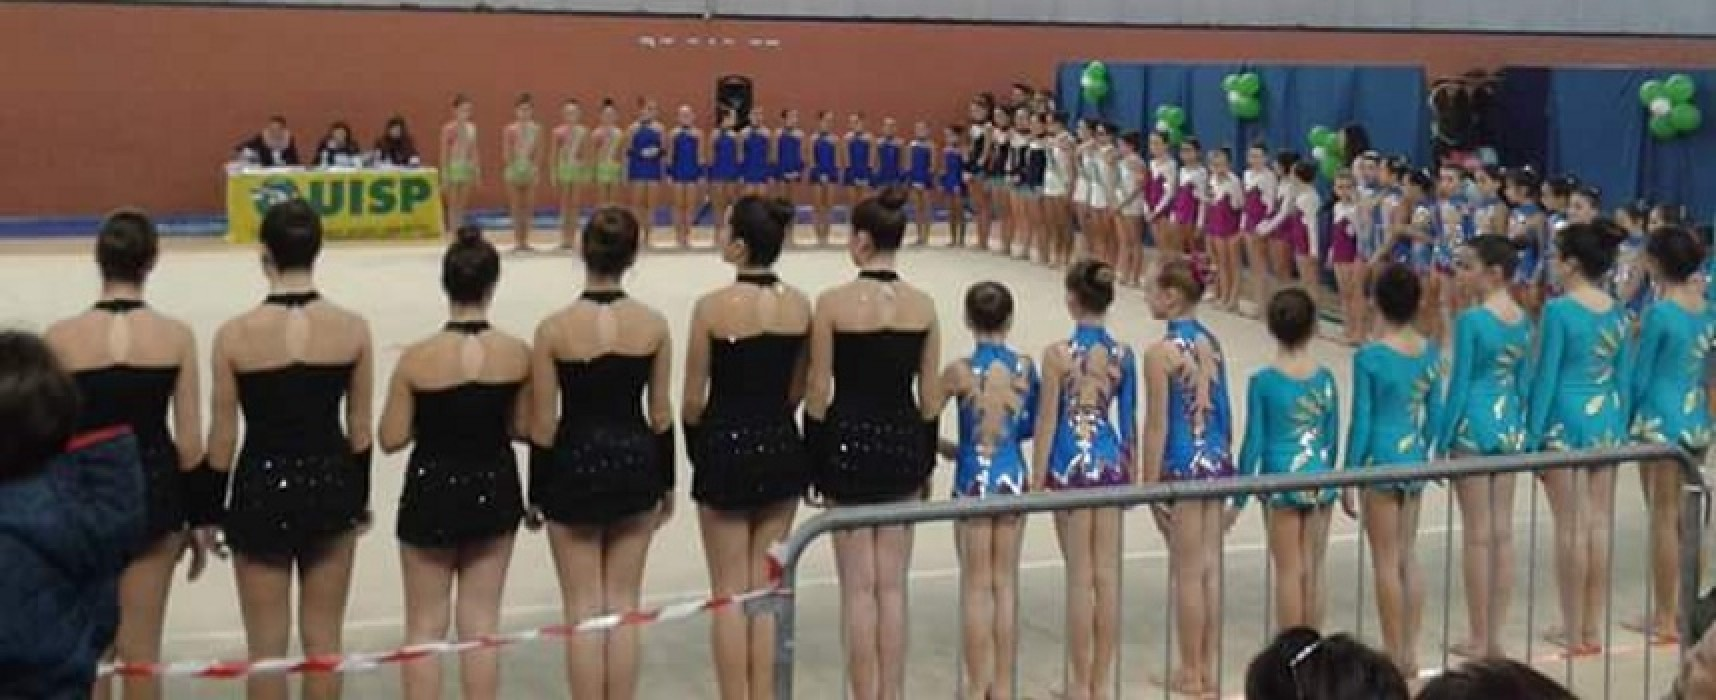 L'Iris porta cinque ginnaste alle finali Nazionali di Specialità